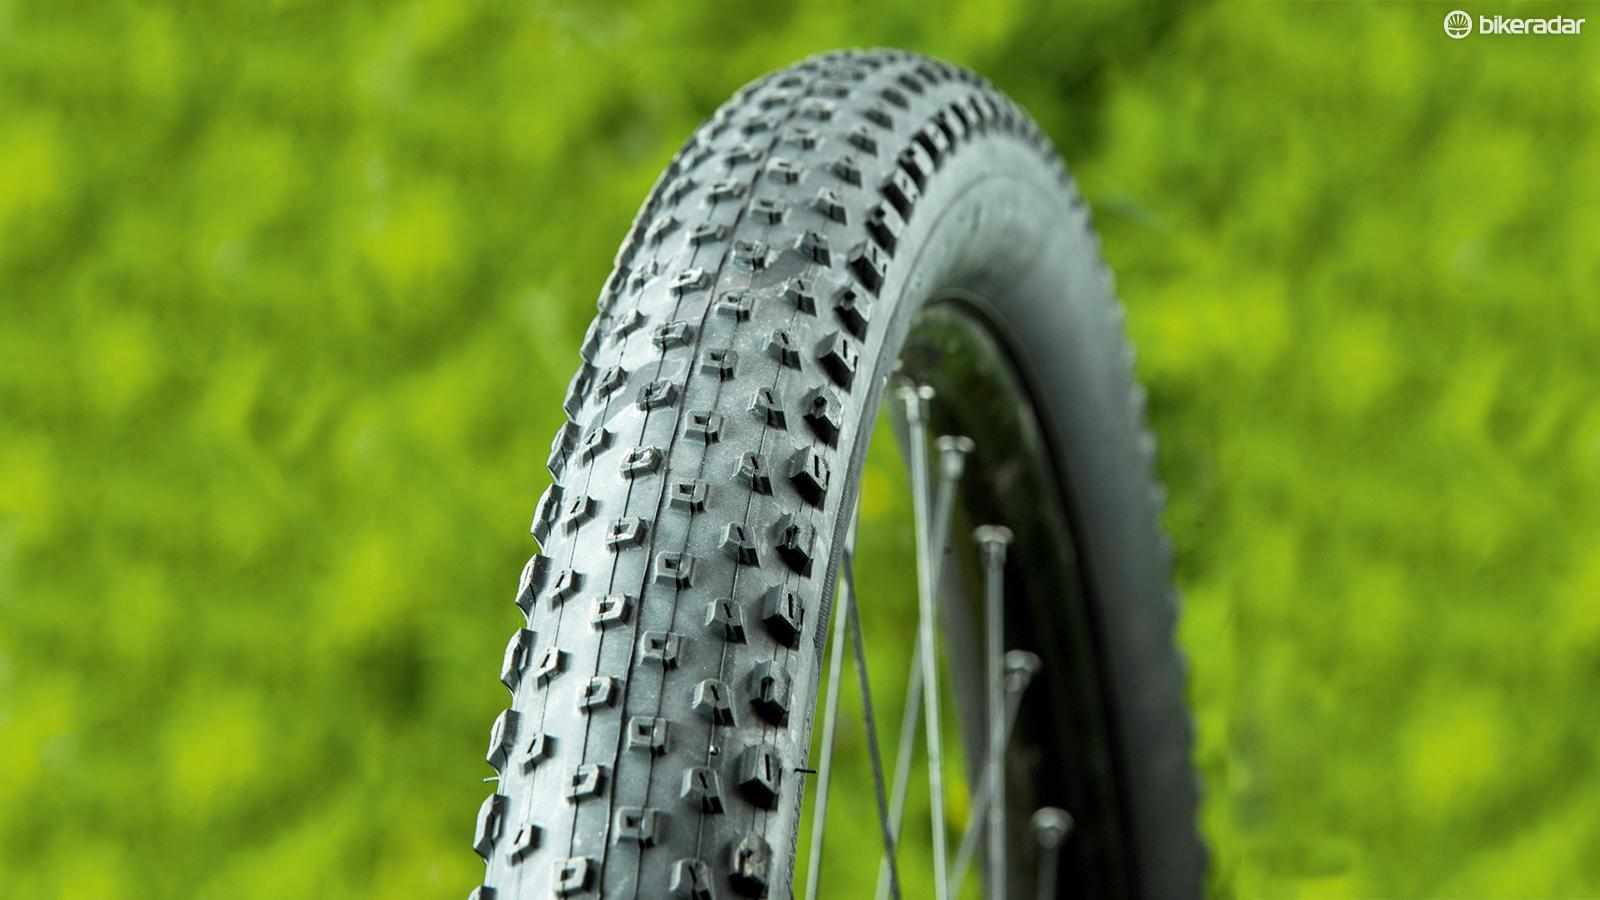 Bontrager XR2 Team Issue mountain bike tyre